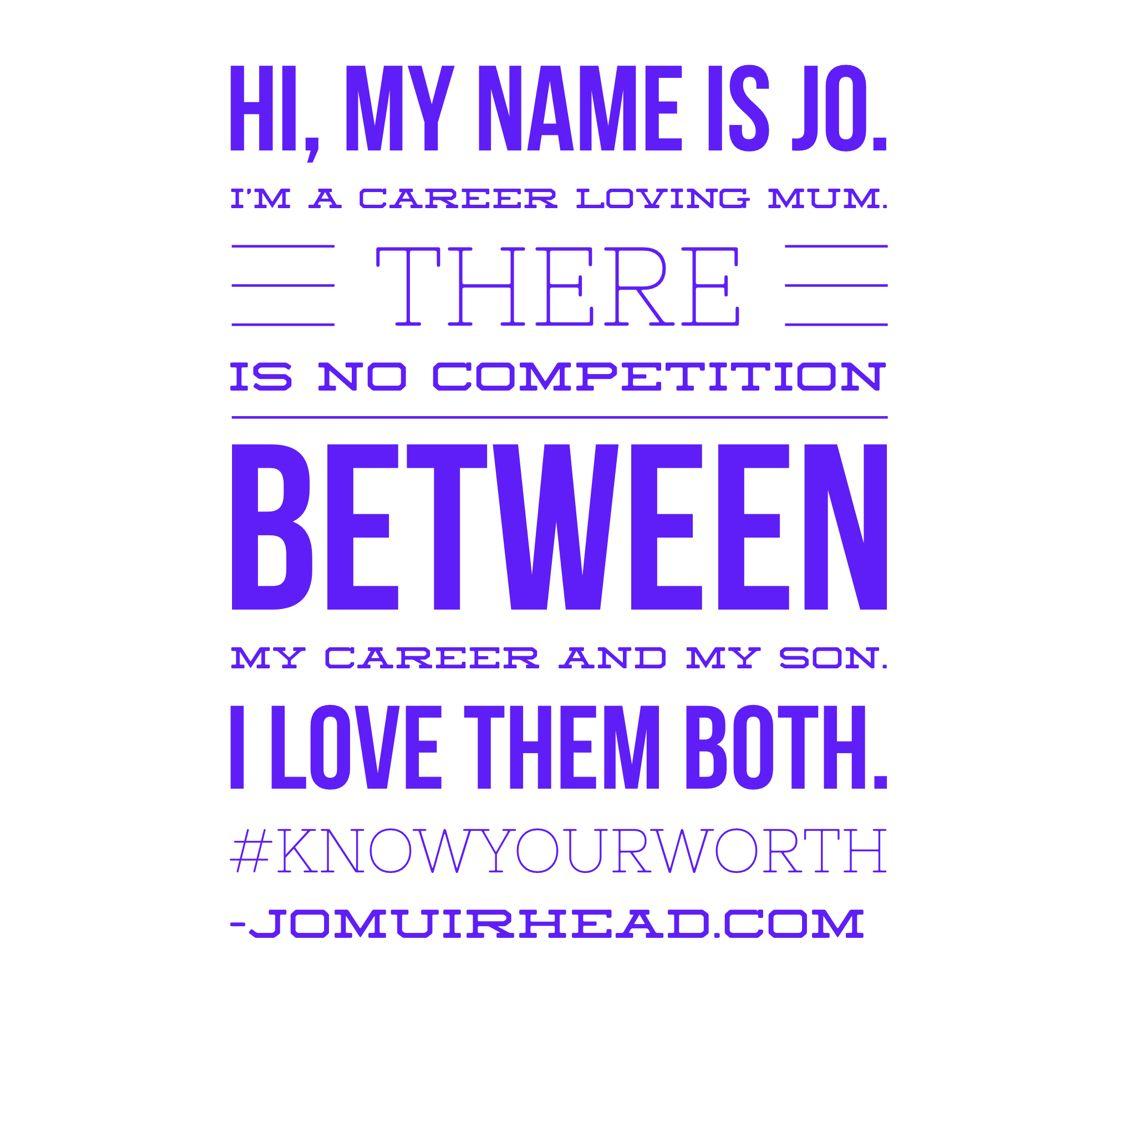 I'm a career loving mum. #mothersday #business #lead #influence #womeninleadership. #knowyourworth